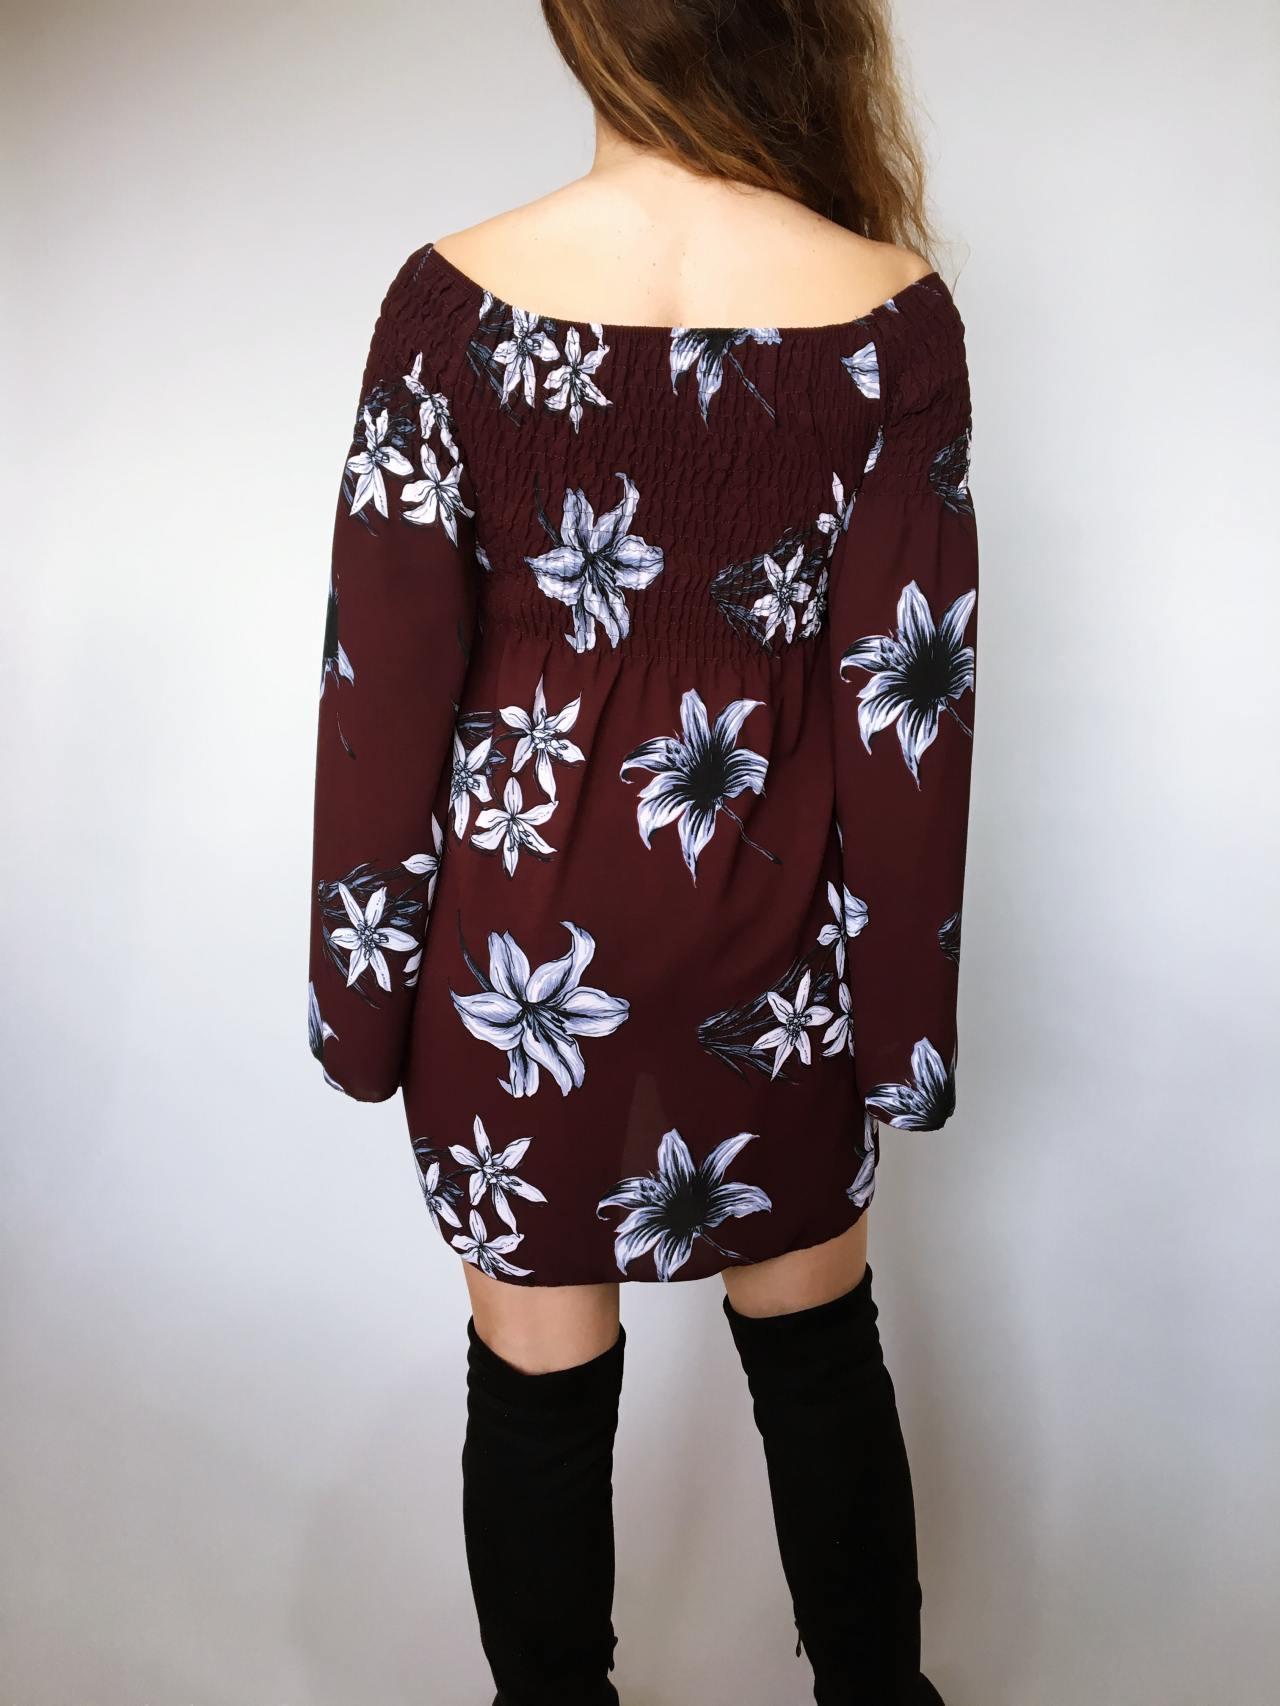 Šaty Lilie bordó 04